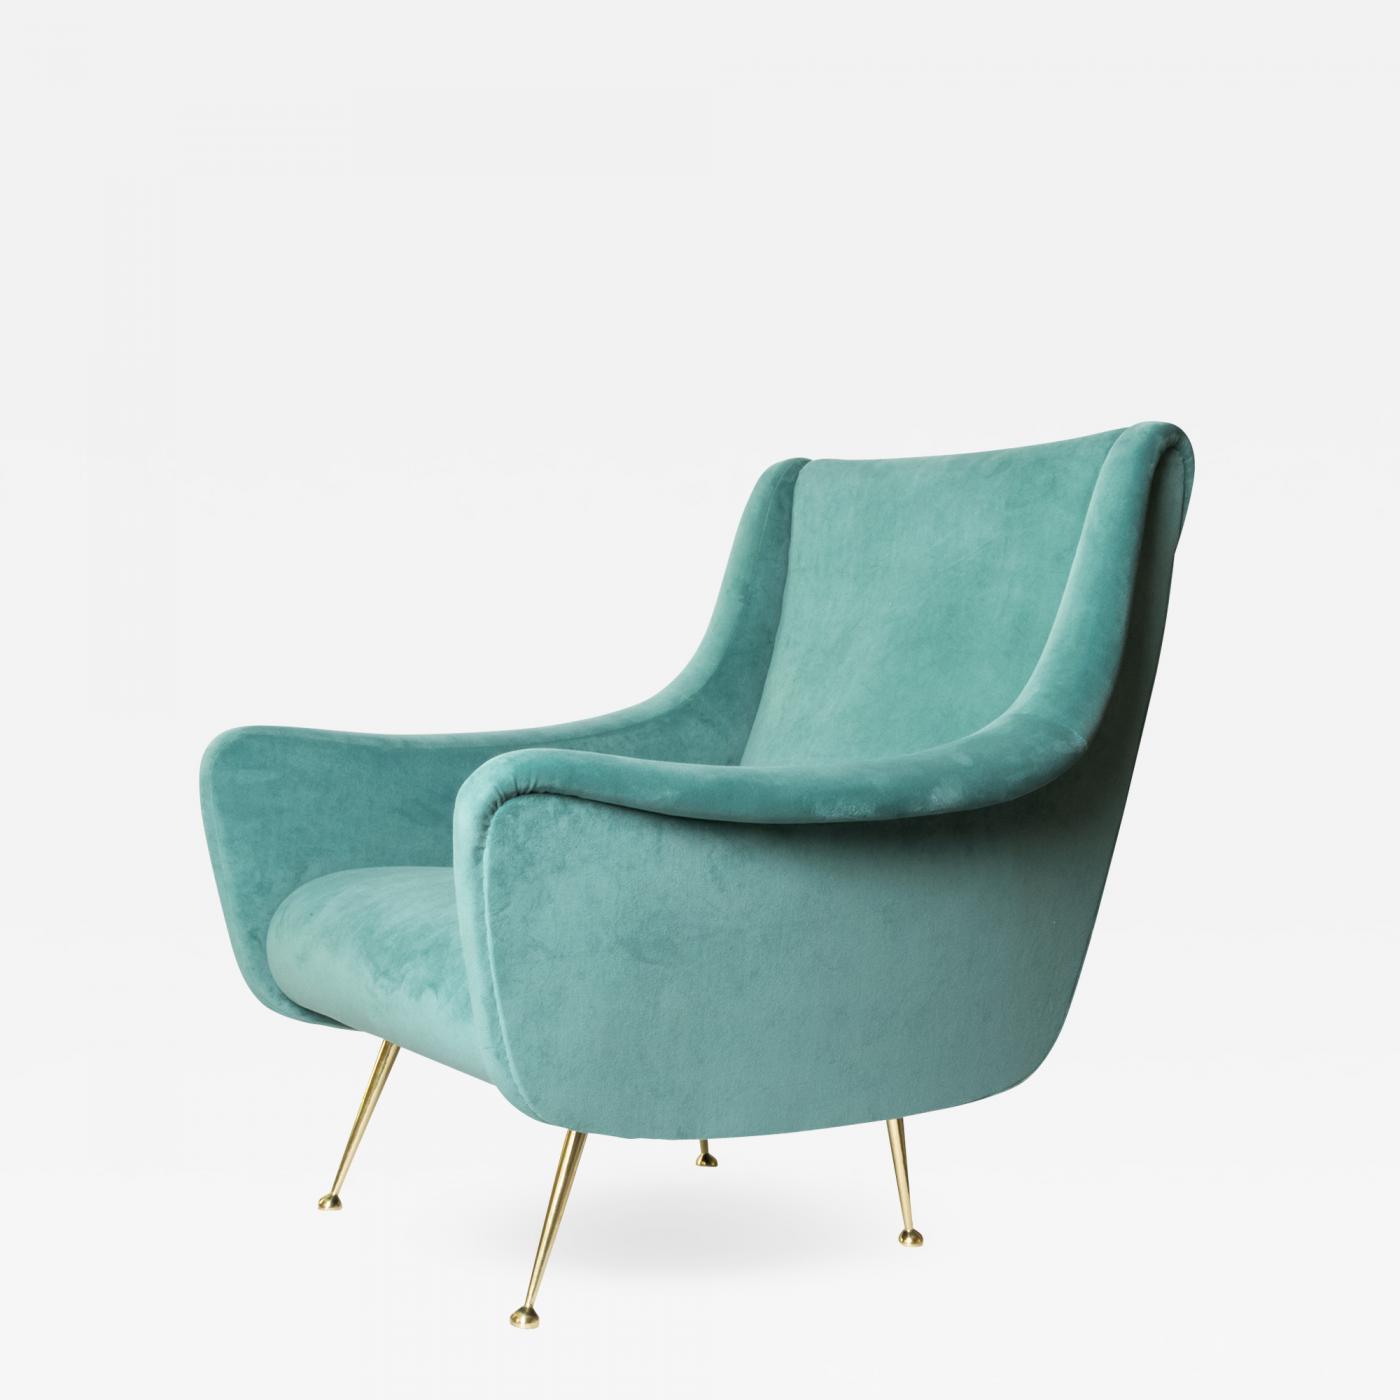 Wondrous Lenzi Italian Mid Century Modern Upholstered Lounge Chair With Brass Legs By Lenzi Ibusinesslaw Wood Chair Design Ideas Ibusinesslaworg